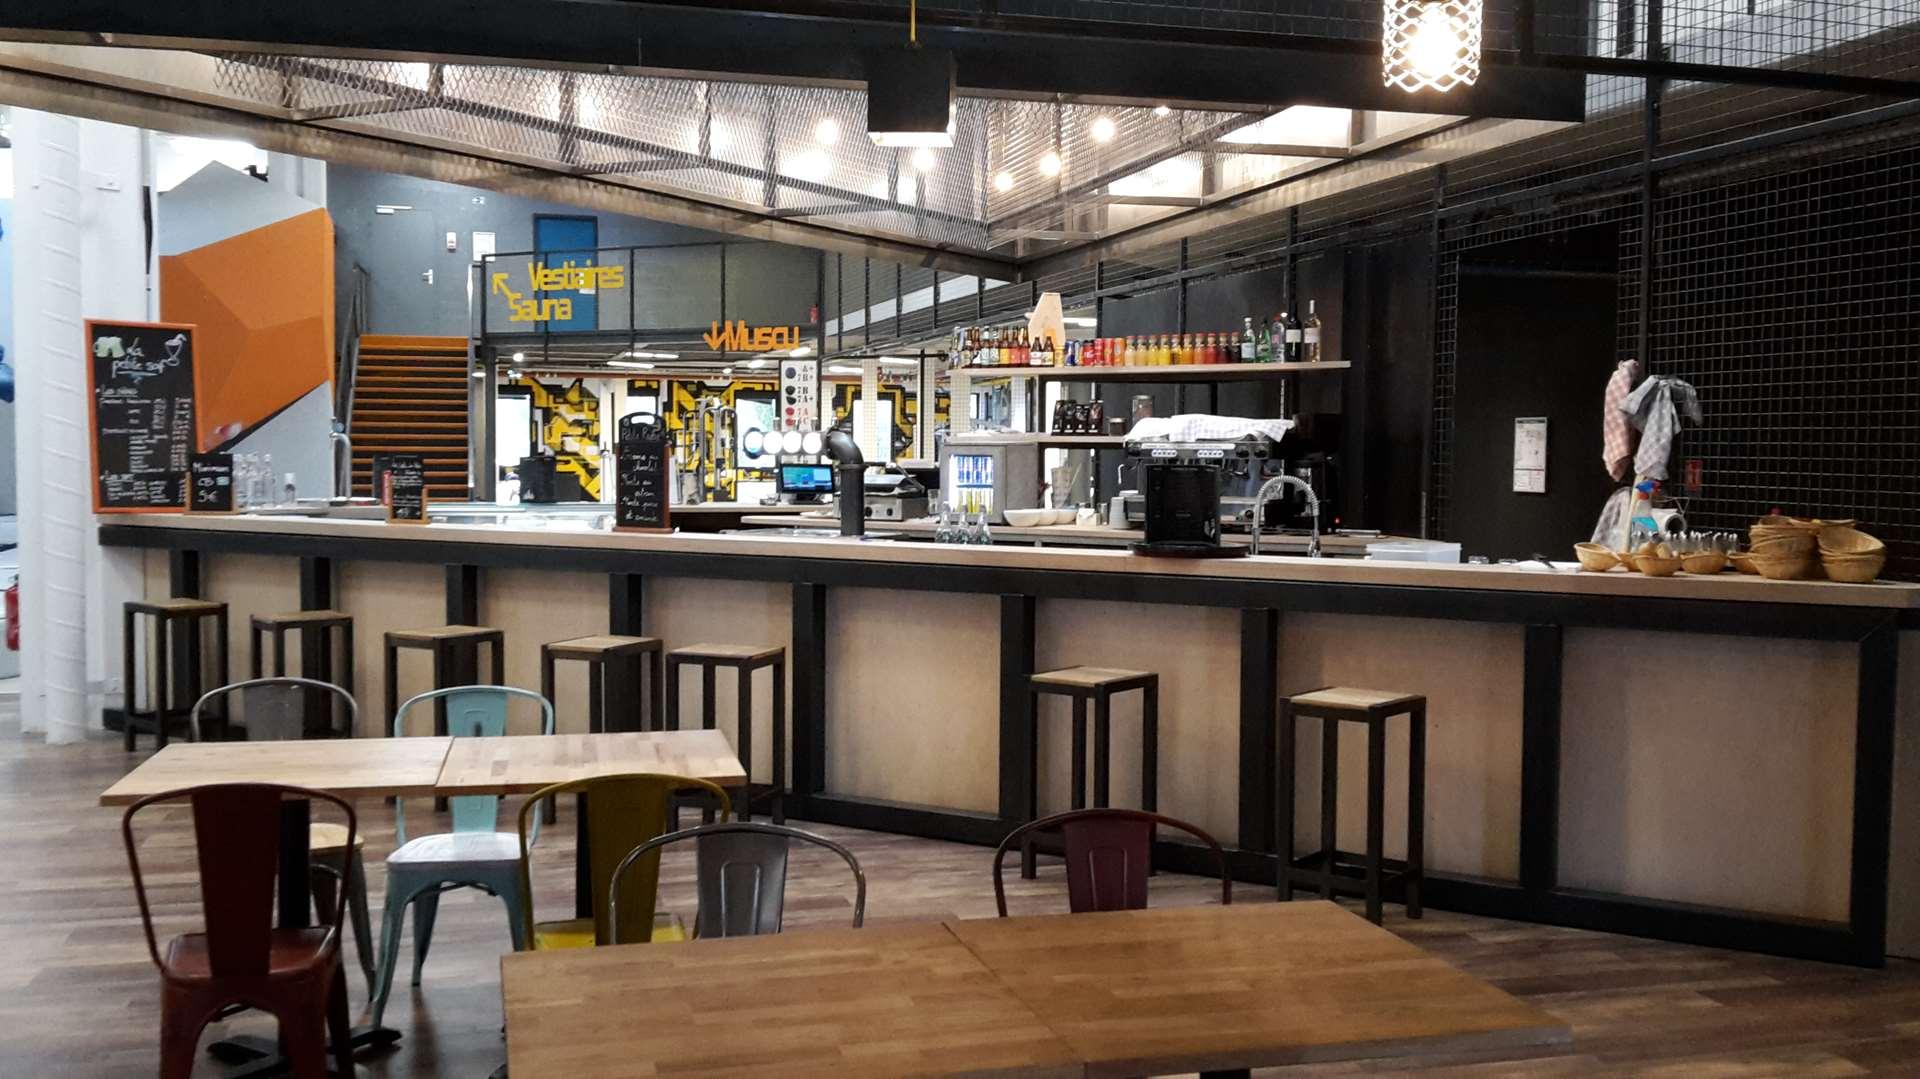 Vertical'Art rungis, blocs, escalade, SAE, restaurant, bar, bière, chill, burgers